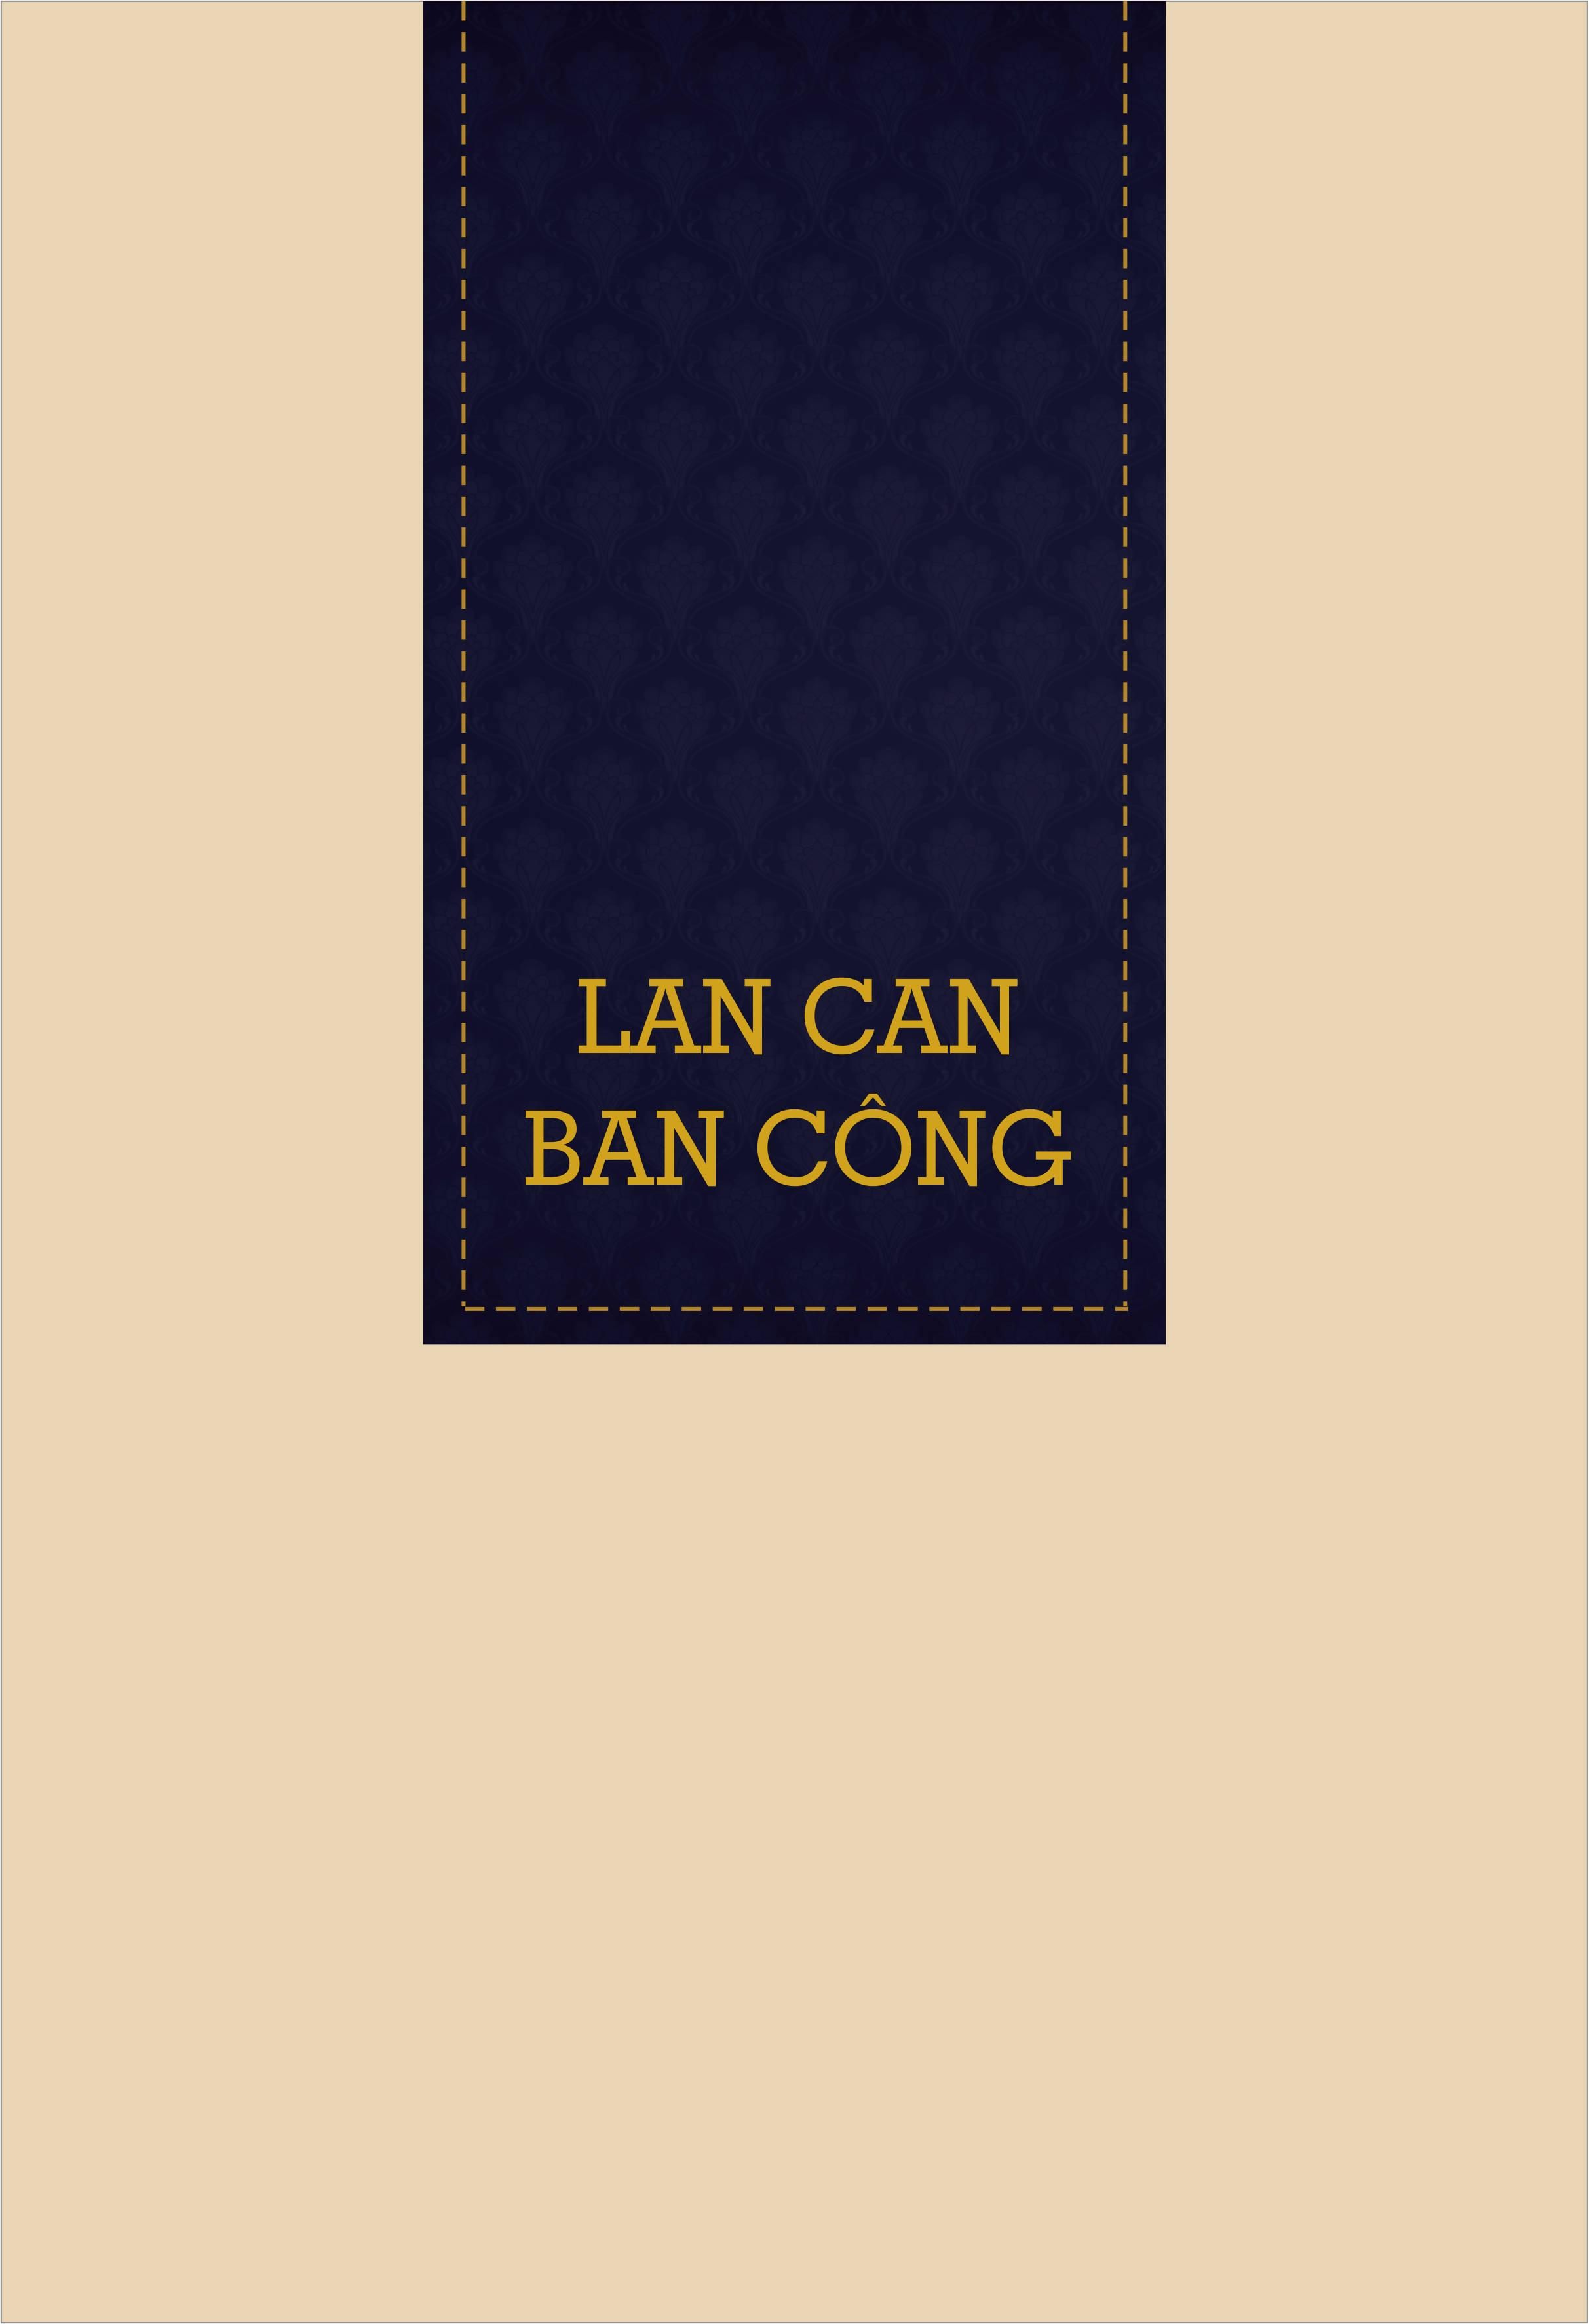 catalogue-lan-can-ban-cong